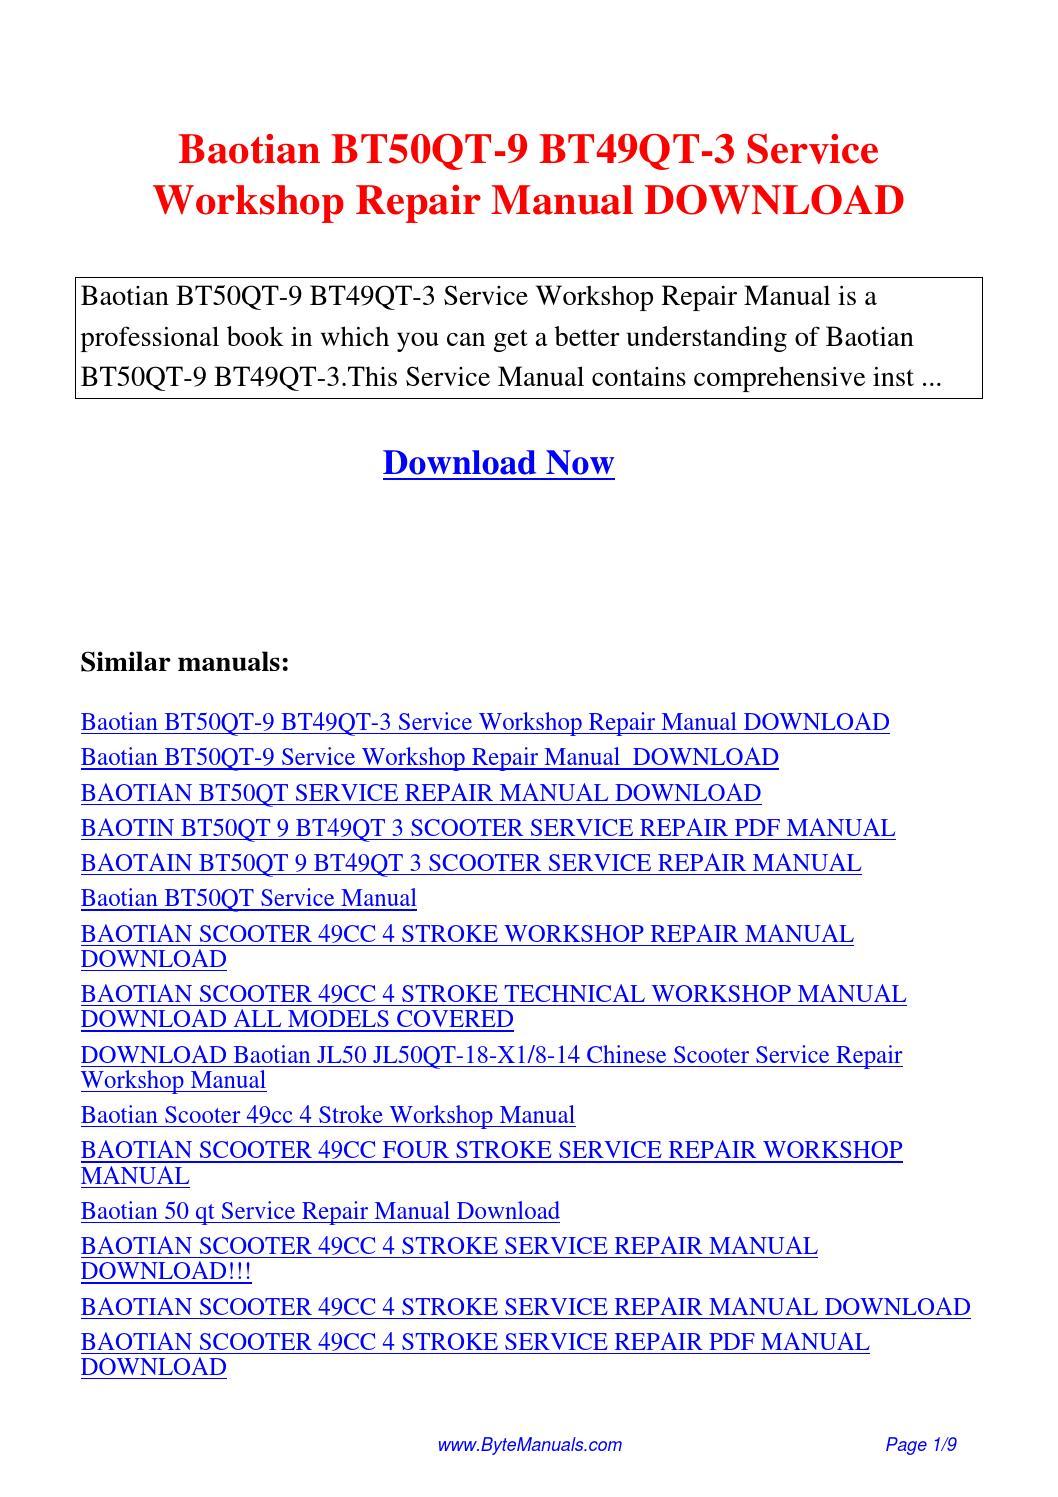 Baotian BT50QT-9 BT49QT-3 Service Workshop Repair Manual.pdf by Kong Hong -  issuu